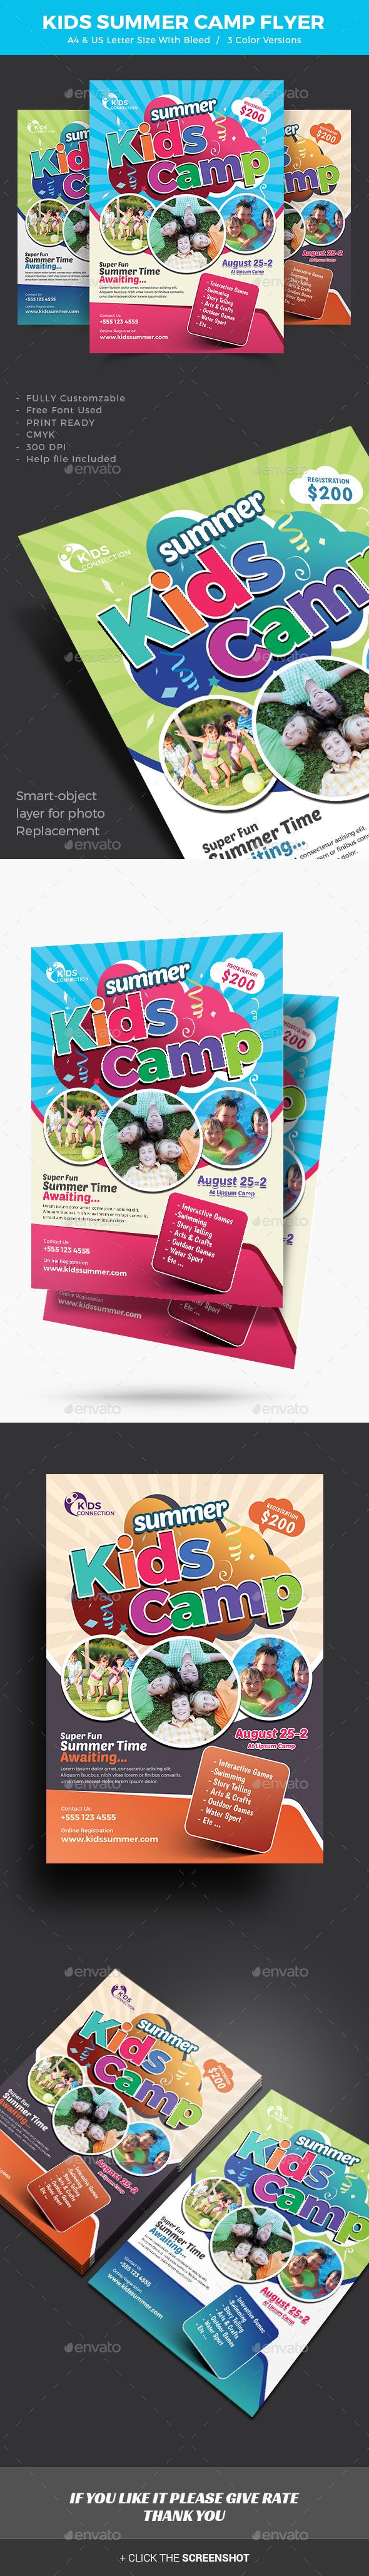 Kids Summer Camp Flyer